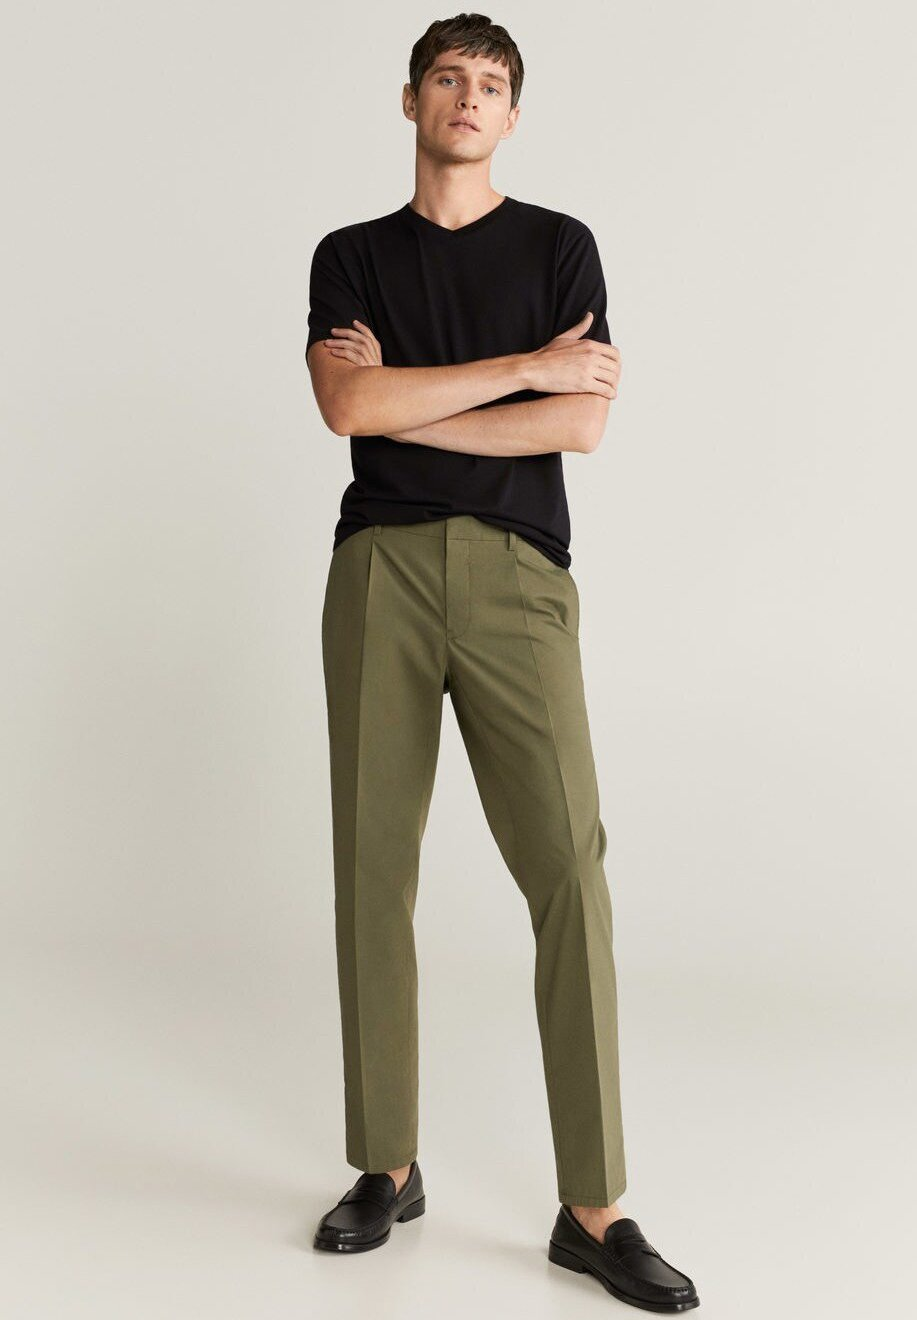 Homme CHELSZ1-I - 3 PACK - T-shirt basique